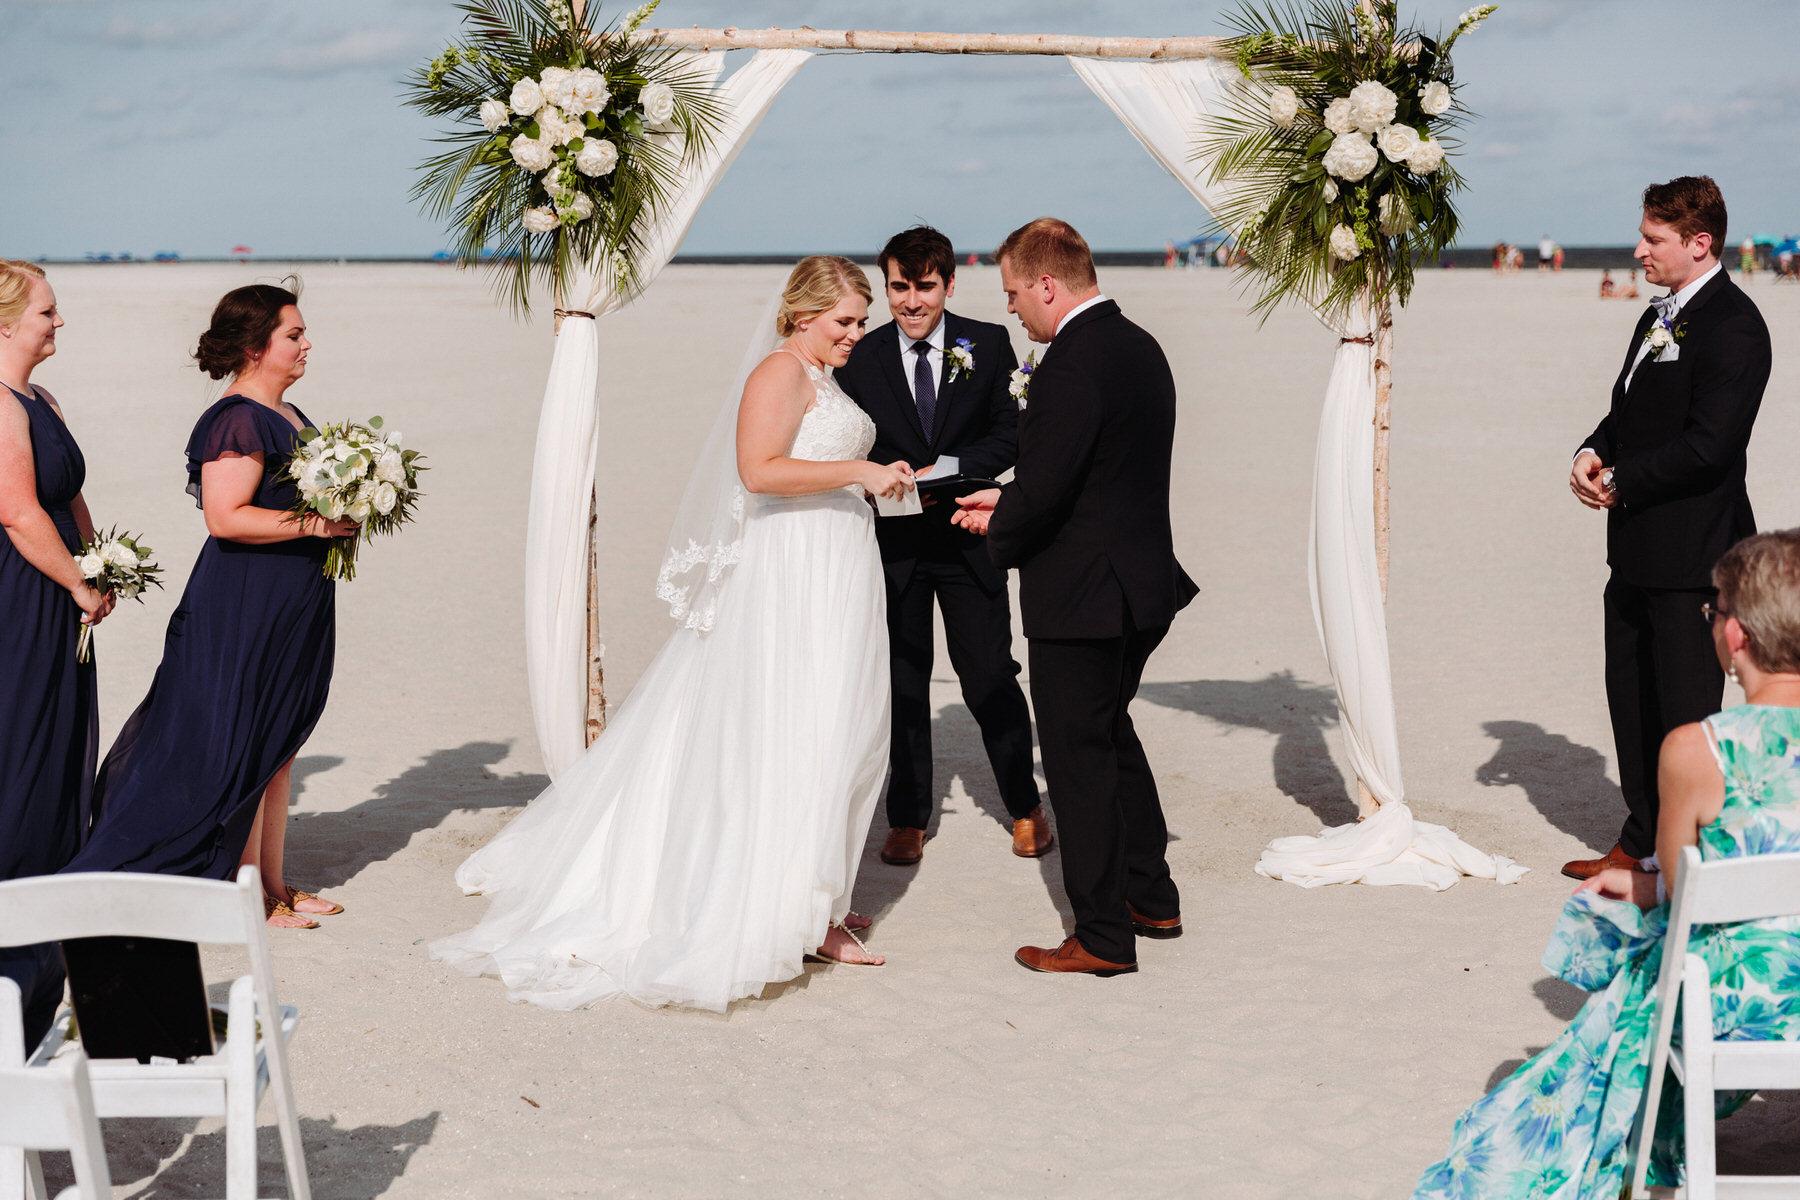 wild-dunes-charleston-isle-of-palms-IOP-wedding-804.JPG